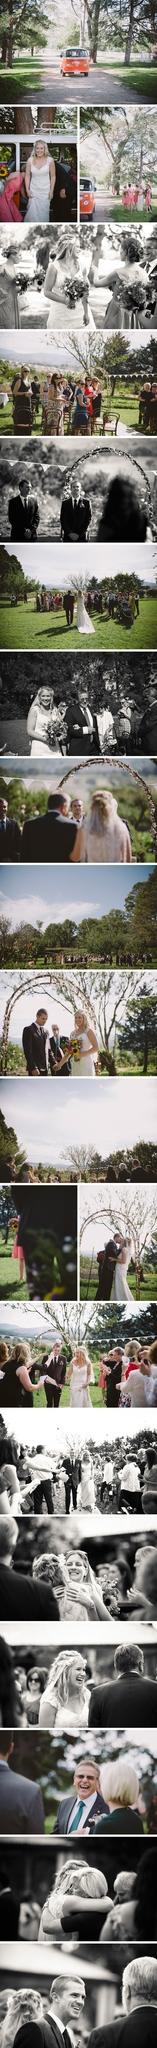 Rustic Lanyon Homestead Wedding Photos